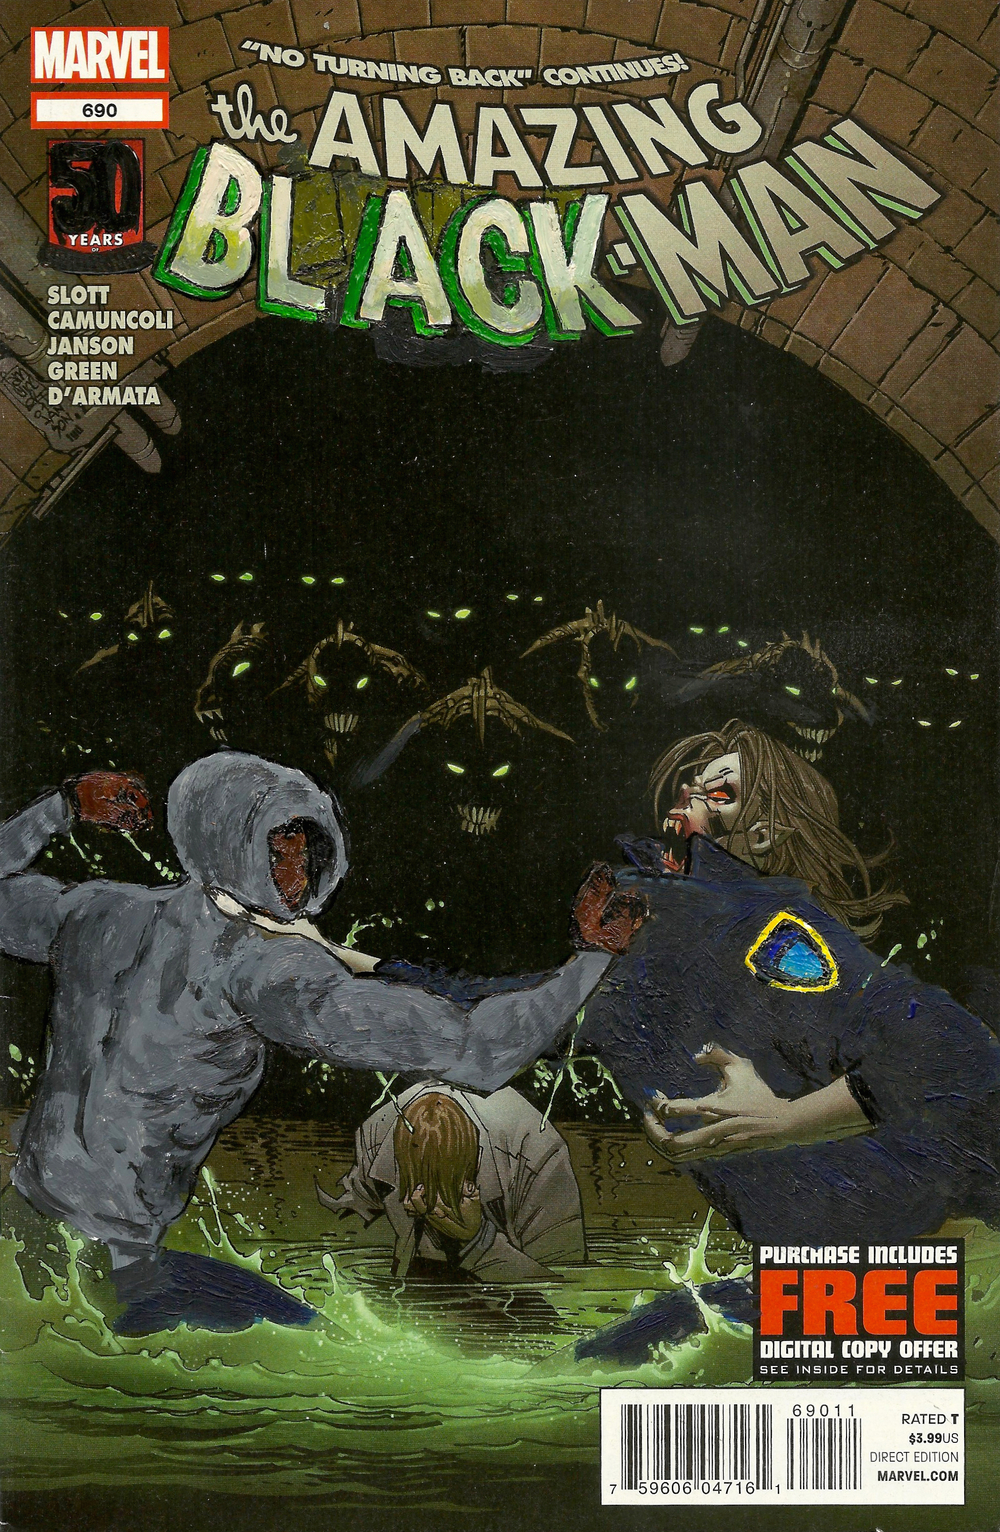 The Amazing Black-Man #690